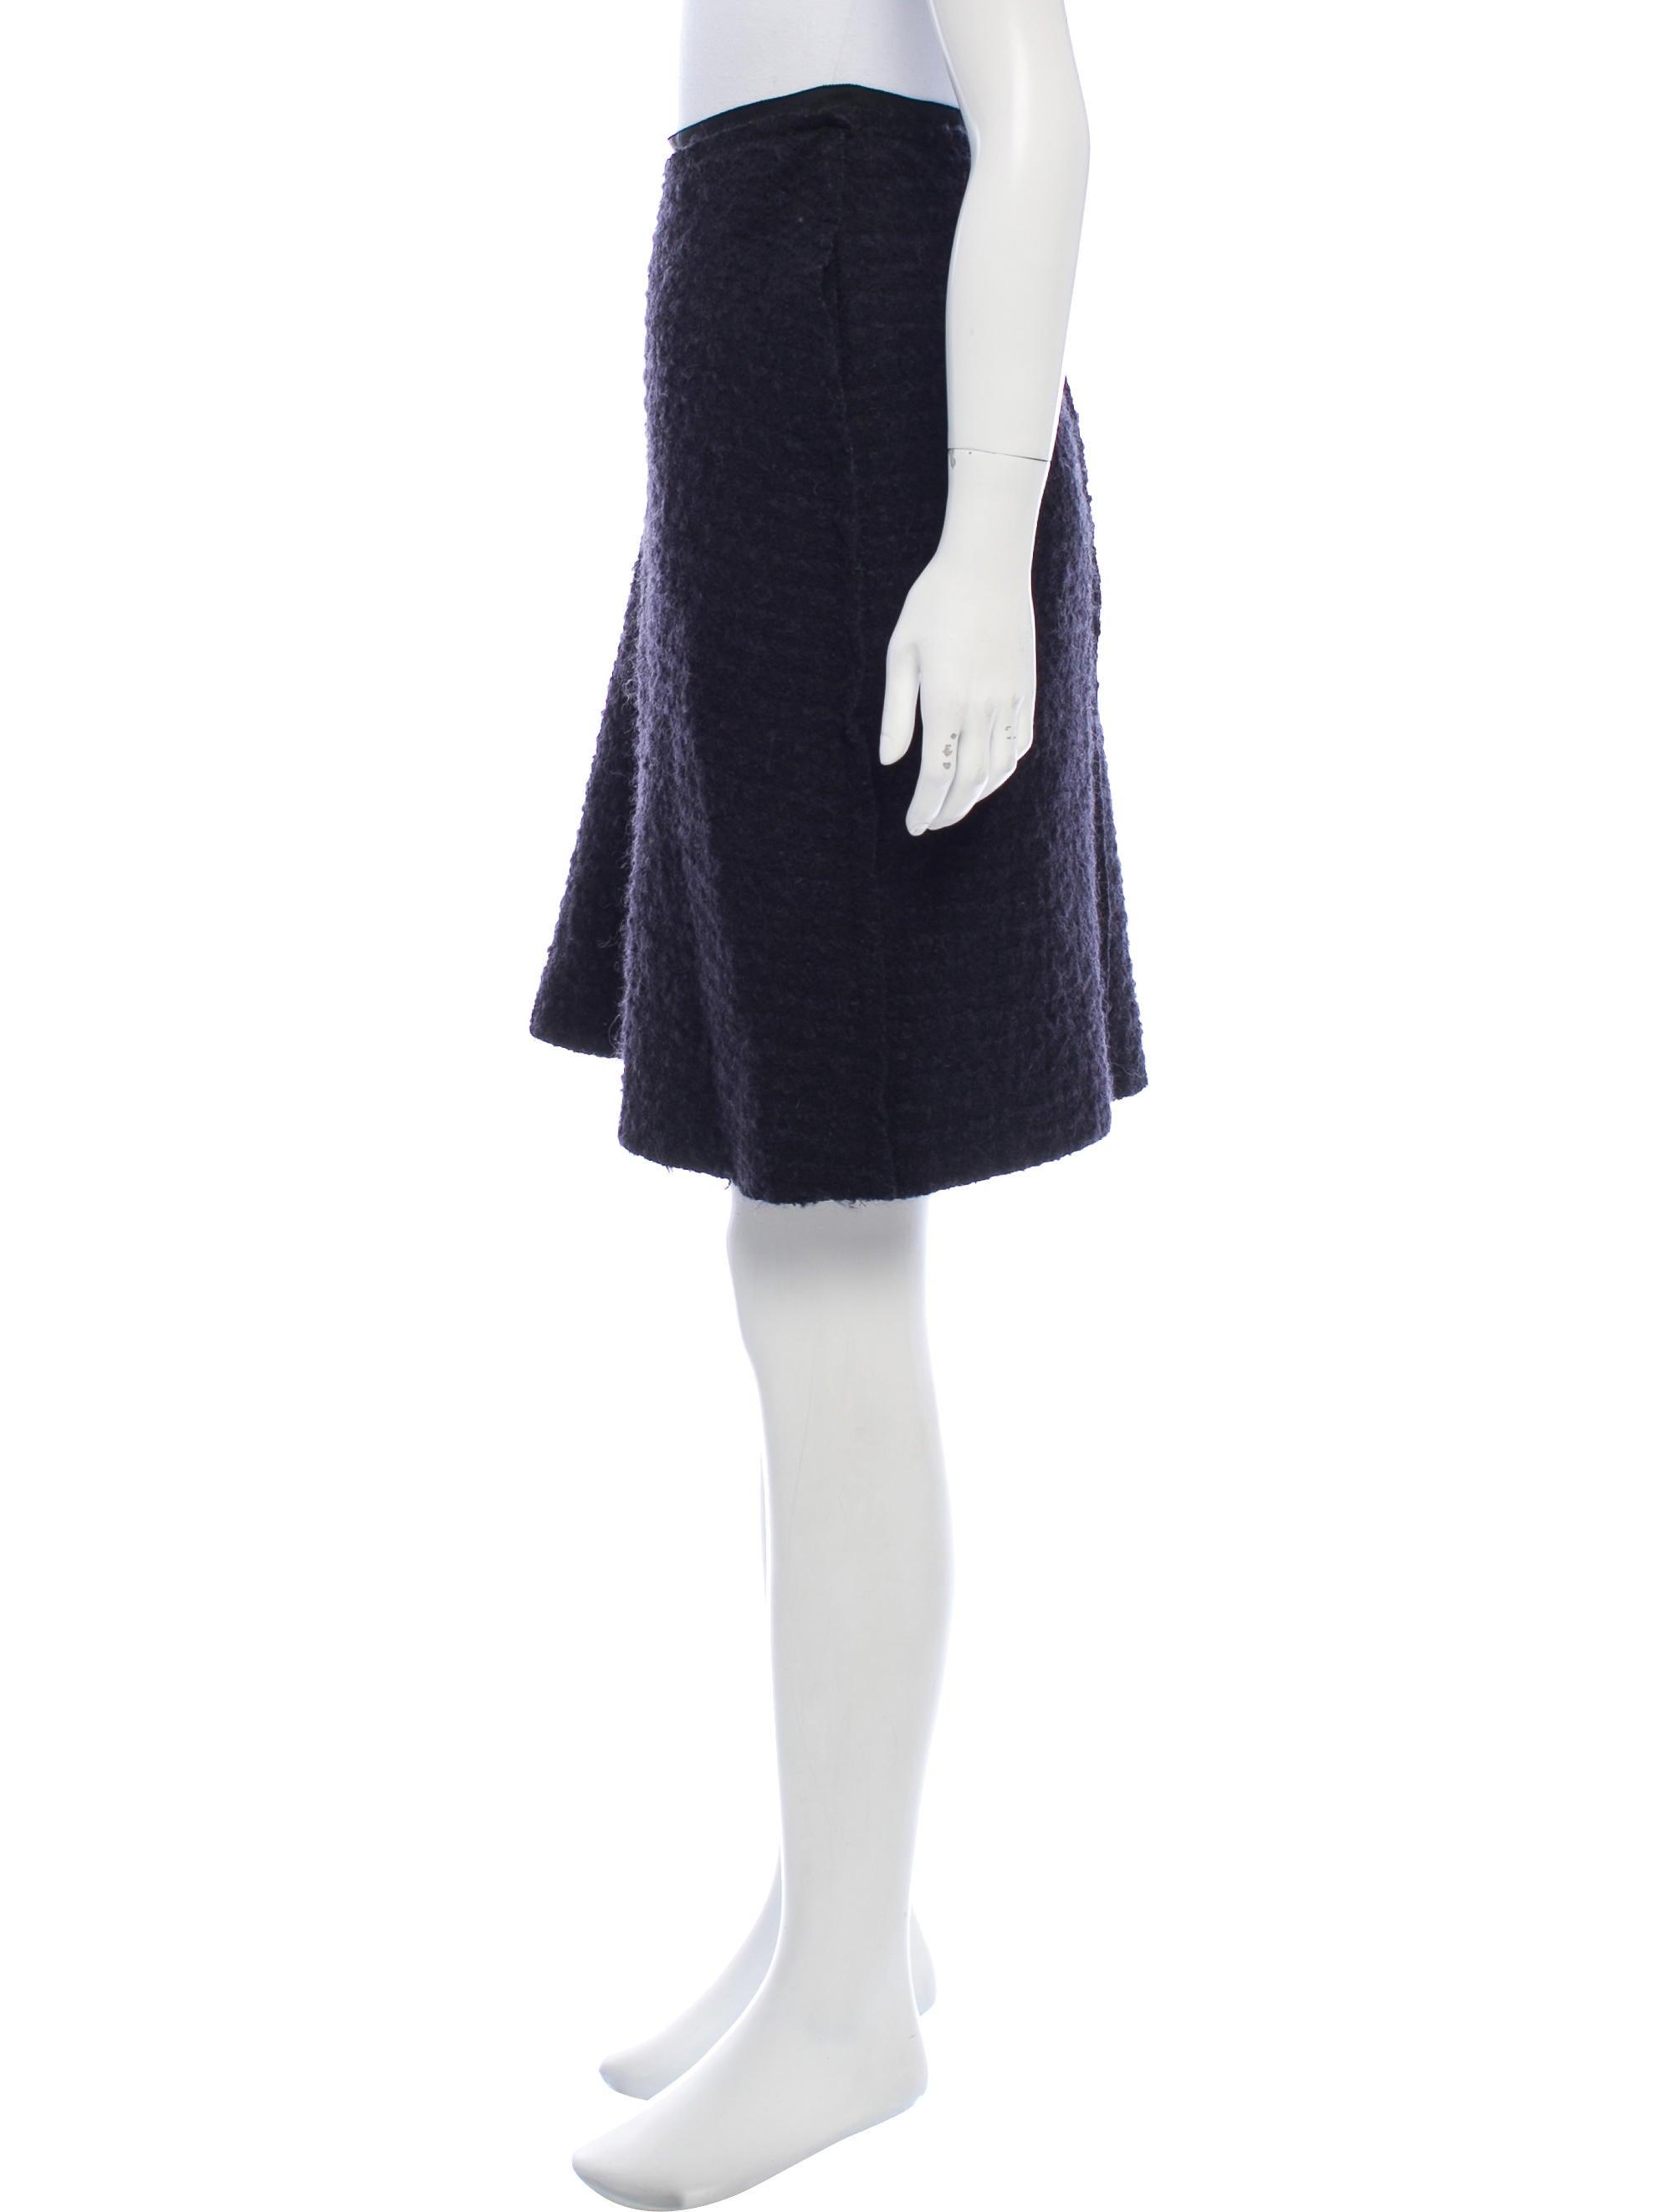 Lanvin Wool-Mohair Knee-Length Skirt Pre Order Cheap Price Cheap Sale Official 2018 New TR8AAe